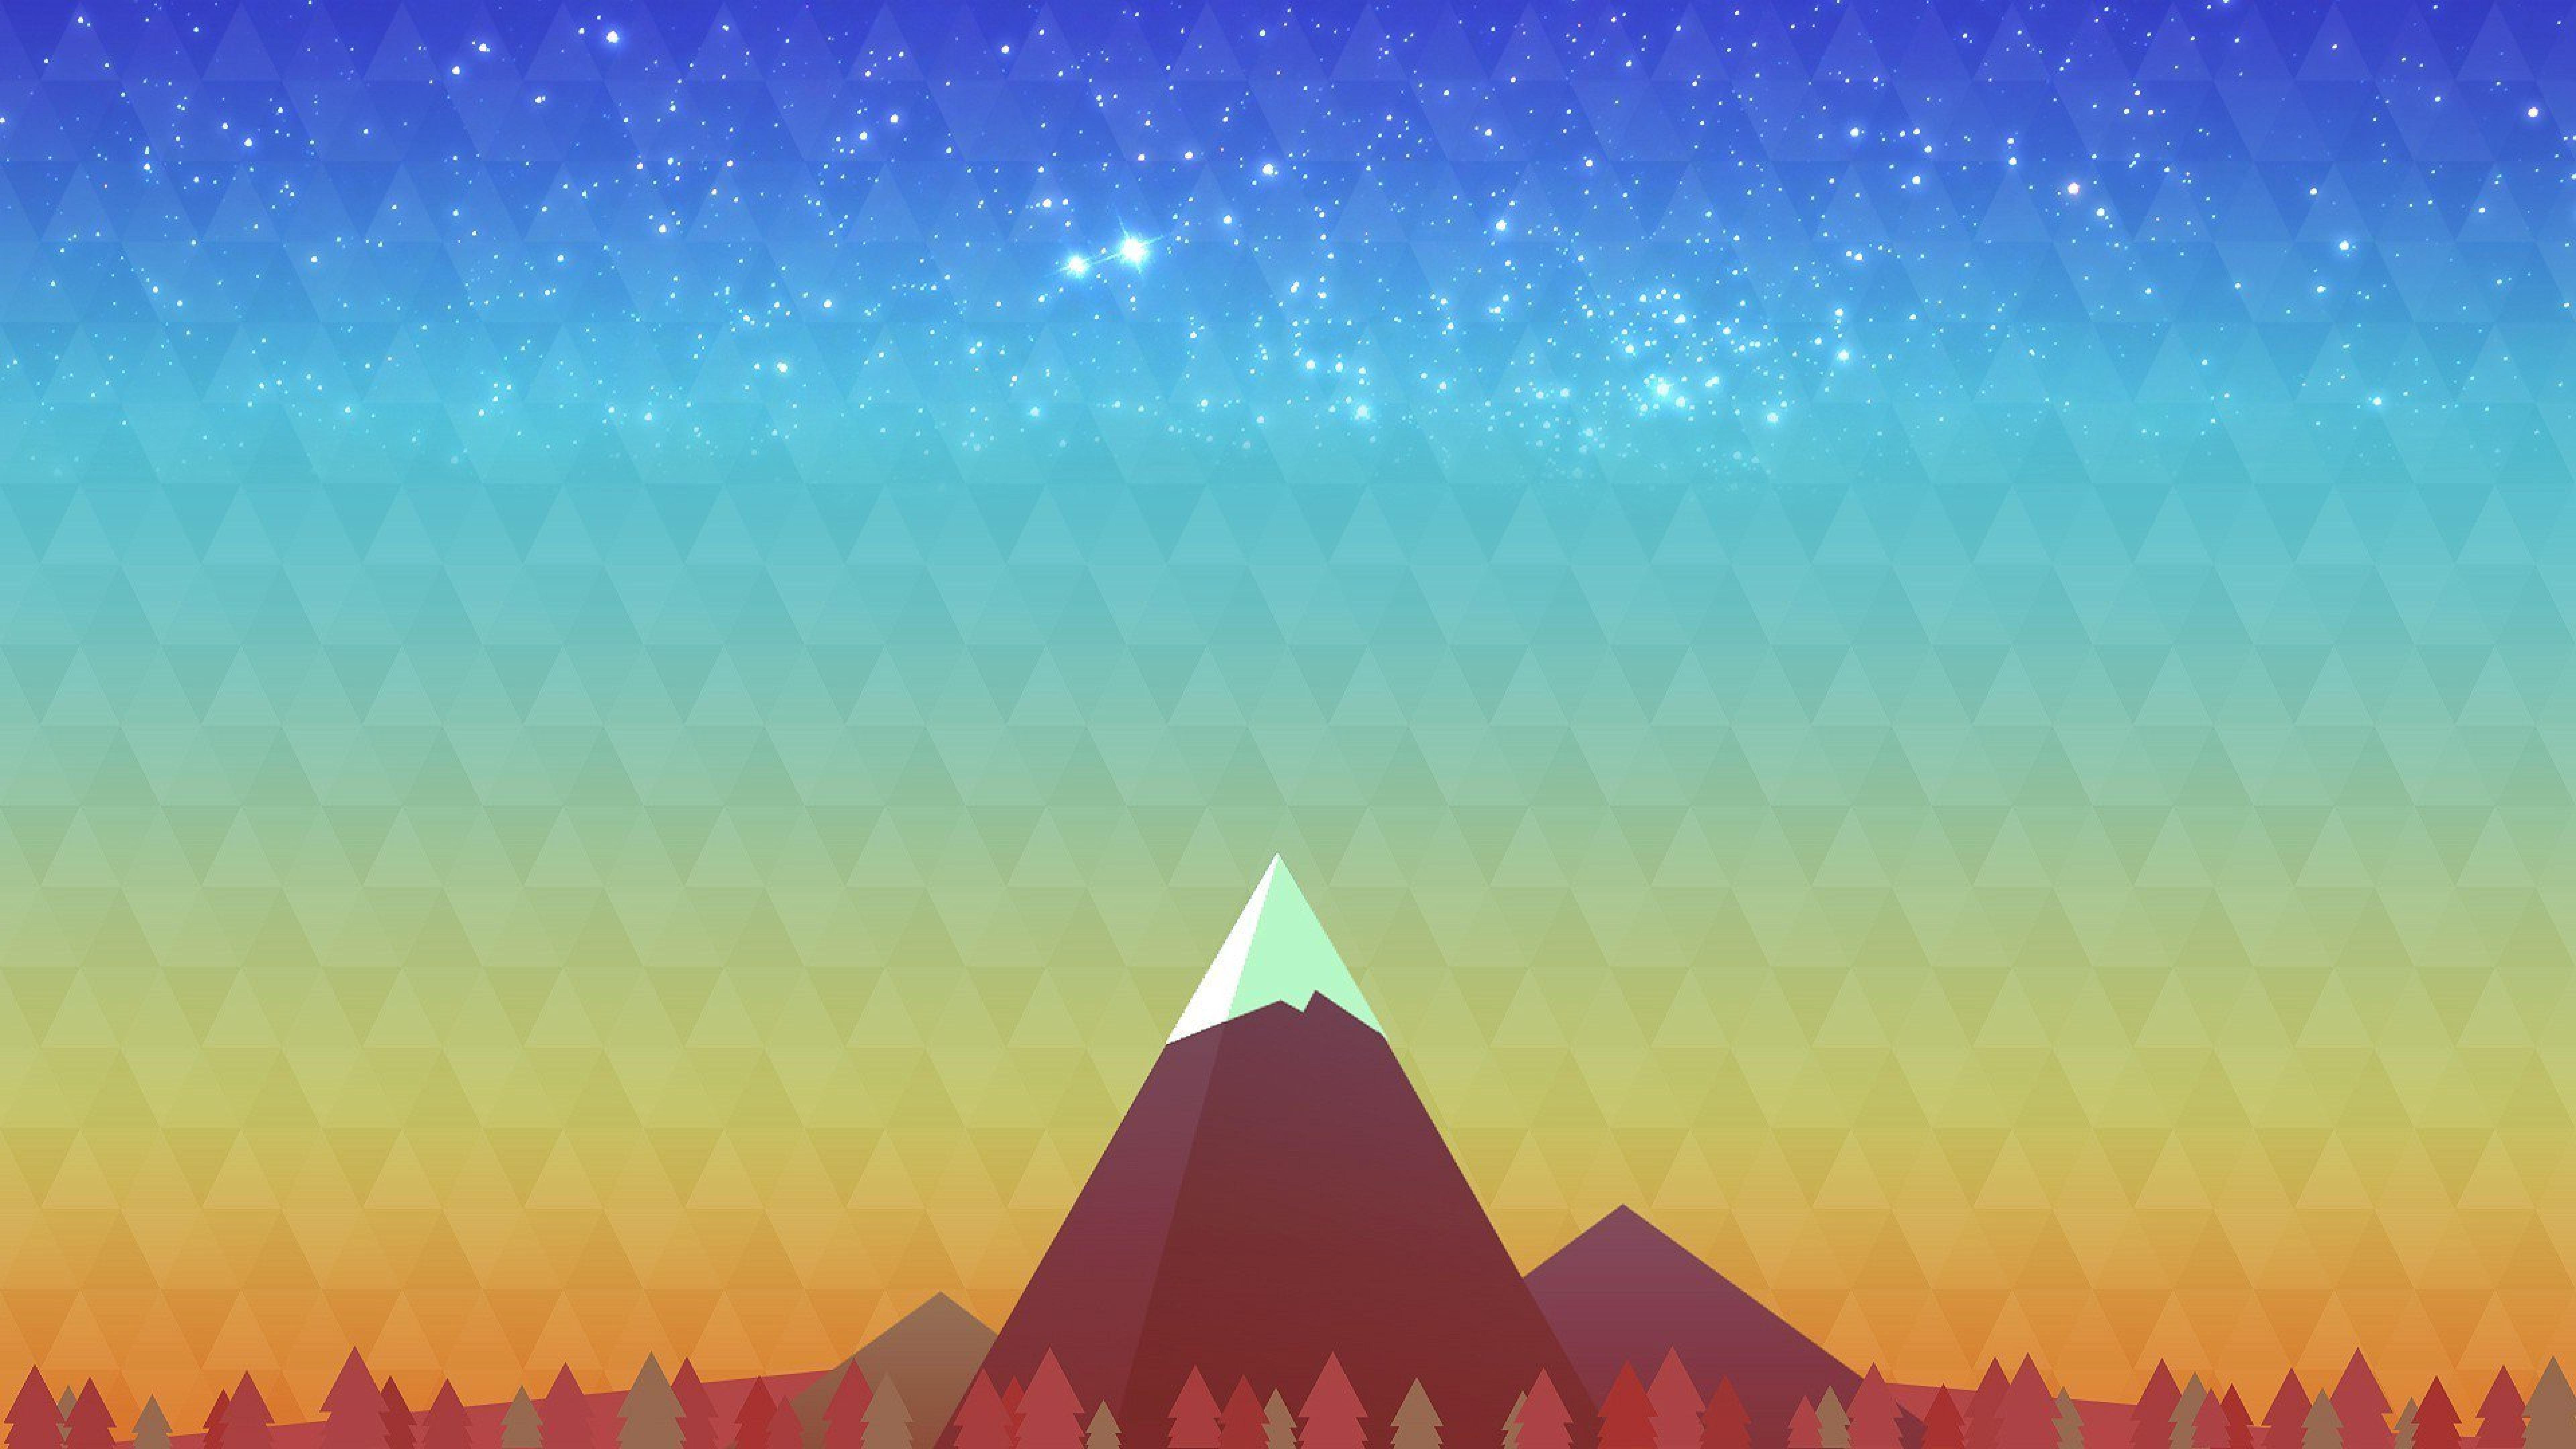 Minimalism Mountain Peak Full Hd Wallpaper